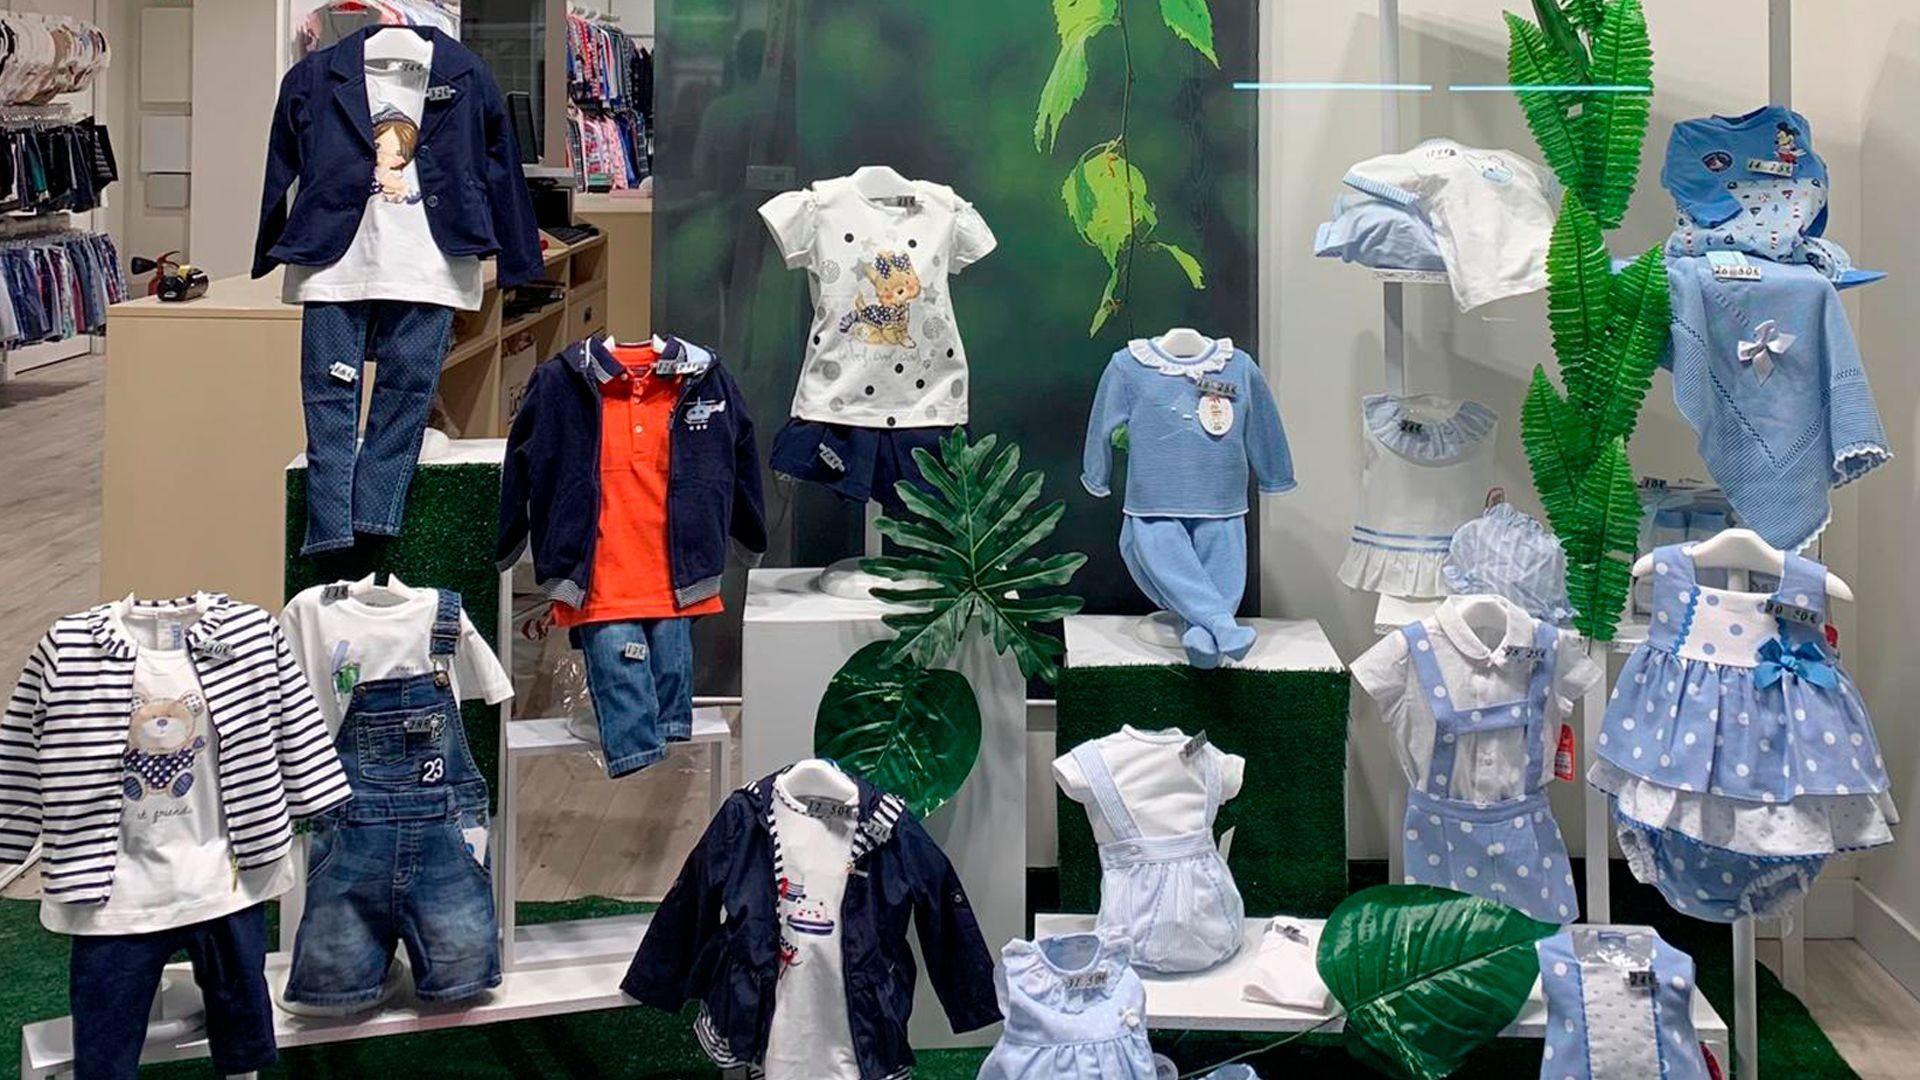 Tienda de ropa infantil en Bilbao